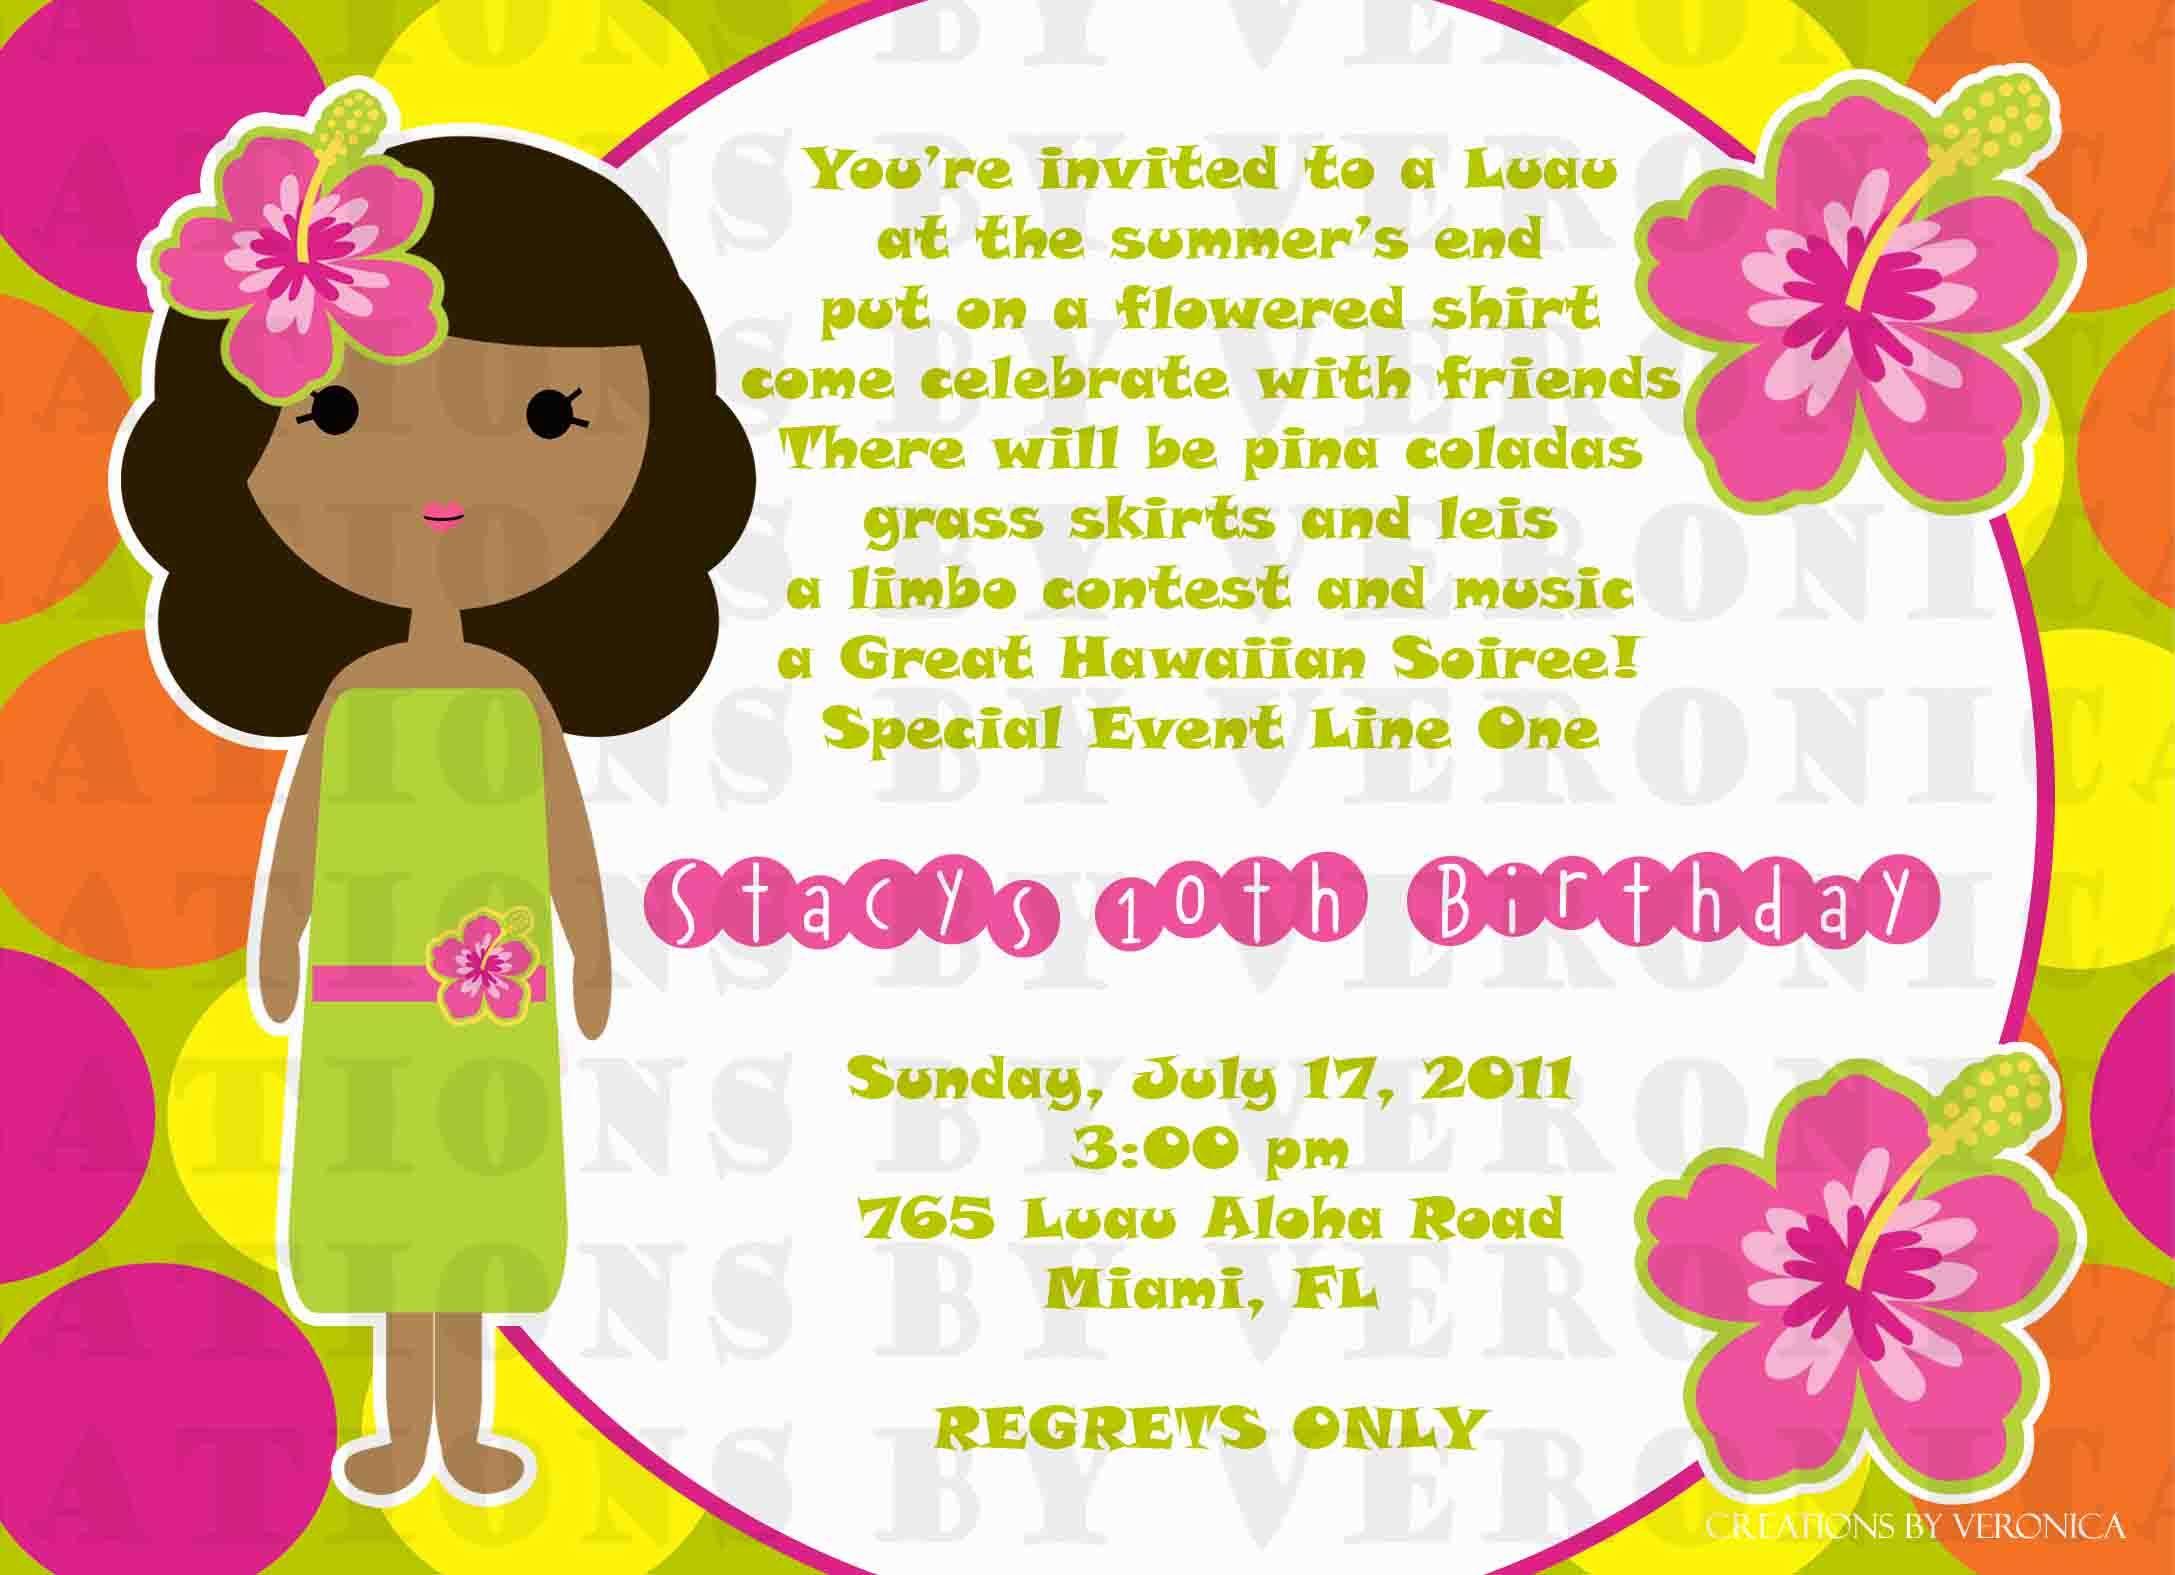 luau invitation wear your luau Google Search special board